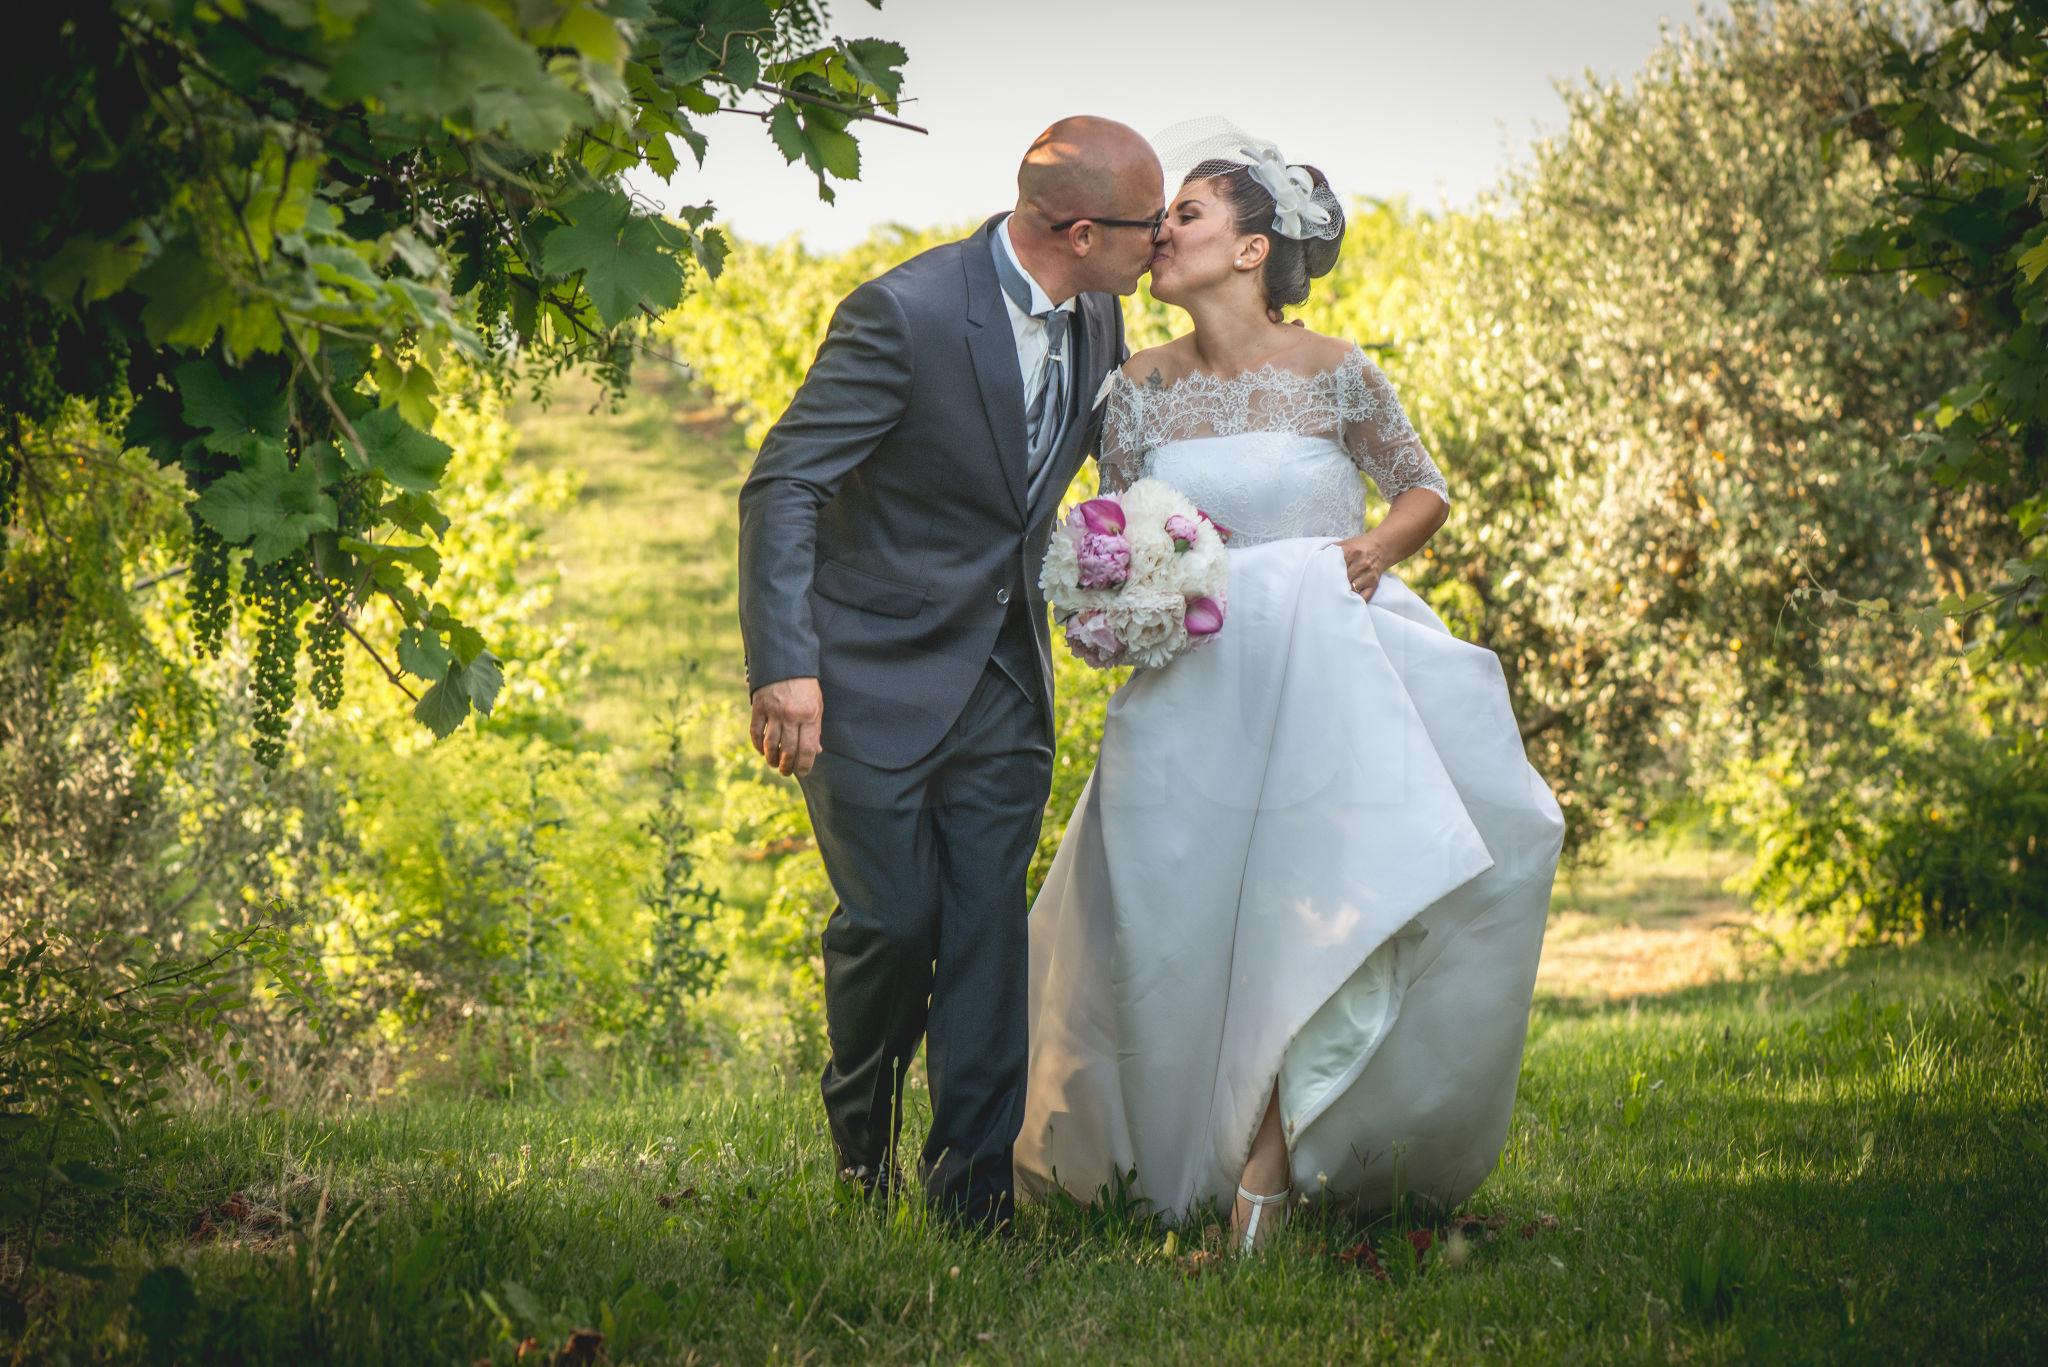 https://lnx.mirkone.it/wp-content/uploads/2015/07/fotografo-matrimoni-faenza-0005.jpg